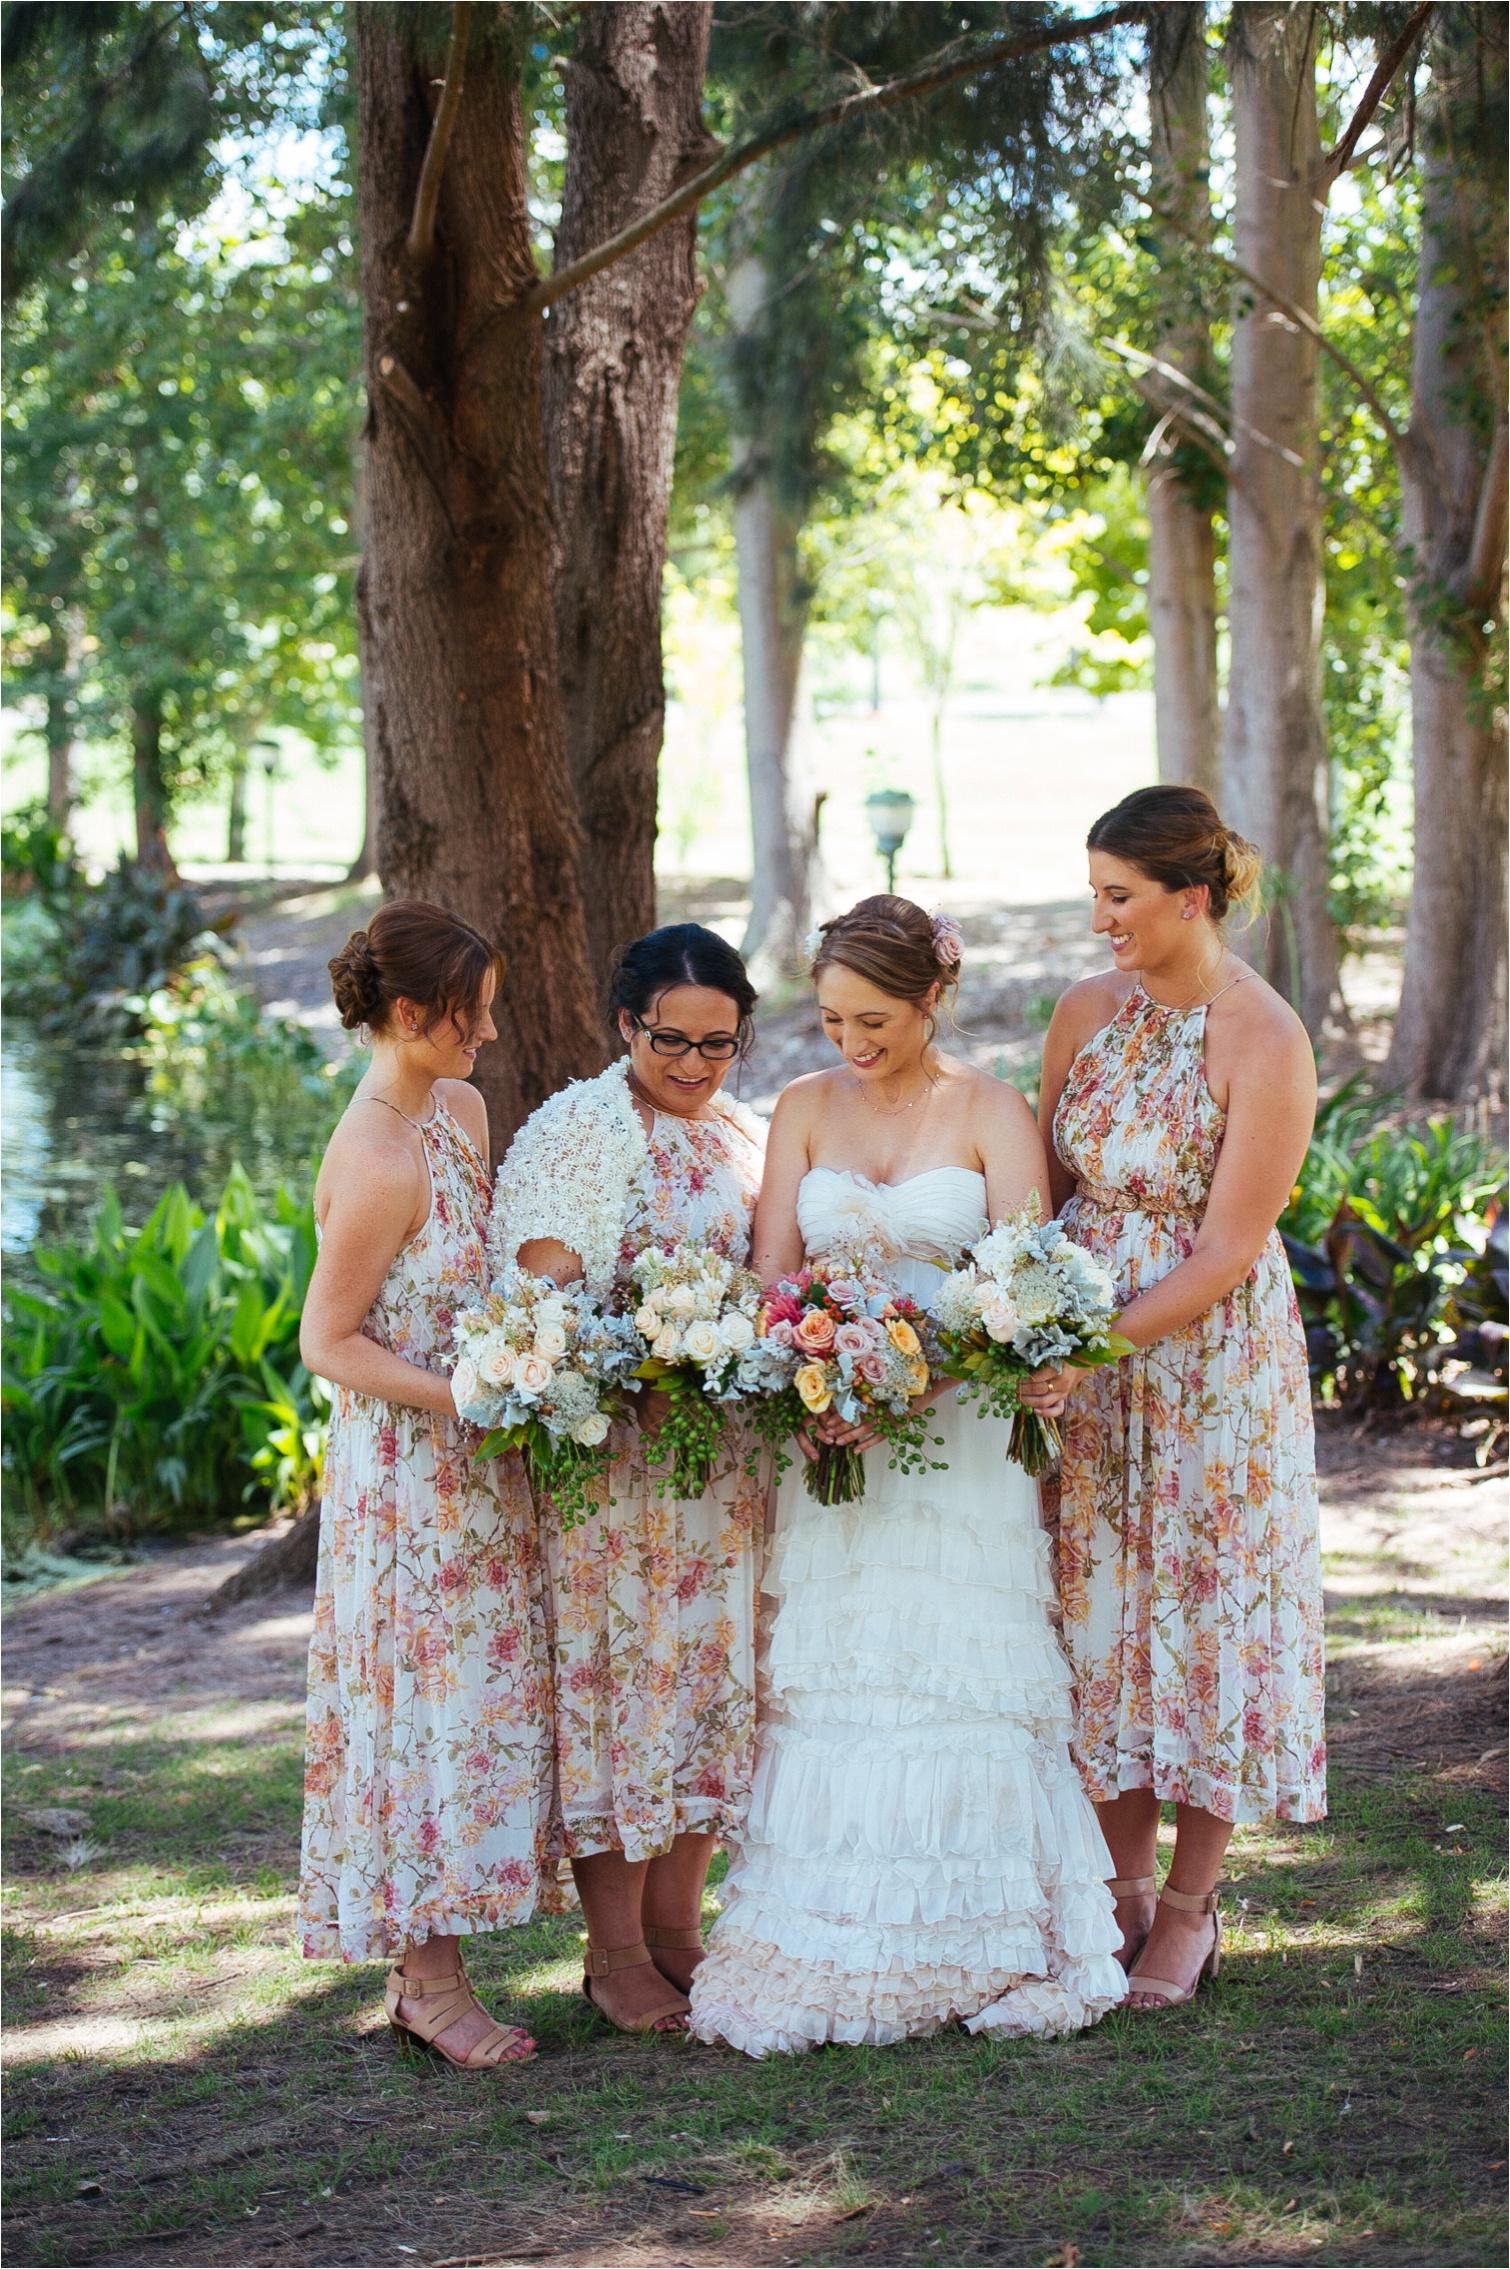 Jenny&Mitch_Sebel_Windsor_Sydney_Polo_Club_wedding-by_The_Follans_Gold_Coast_Wedding_Photographers_0033.jpg